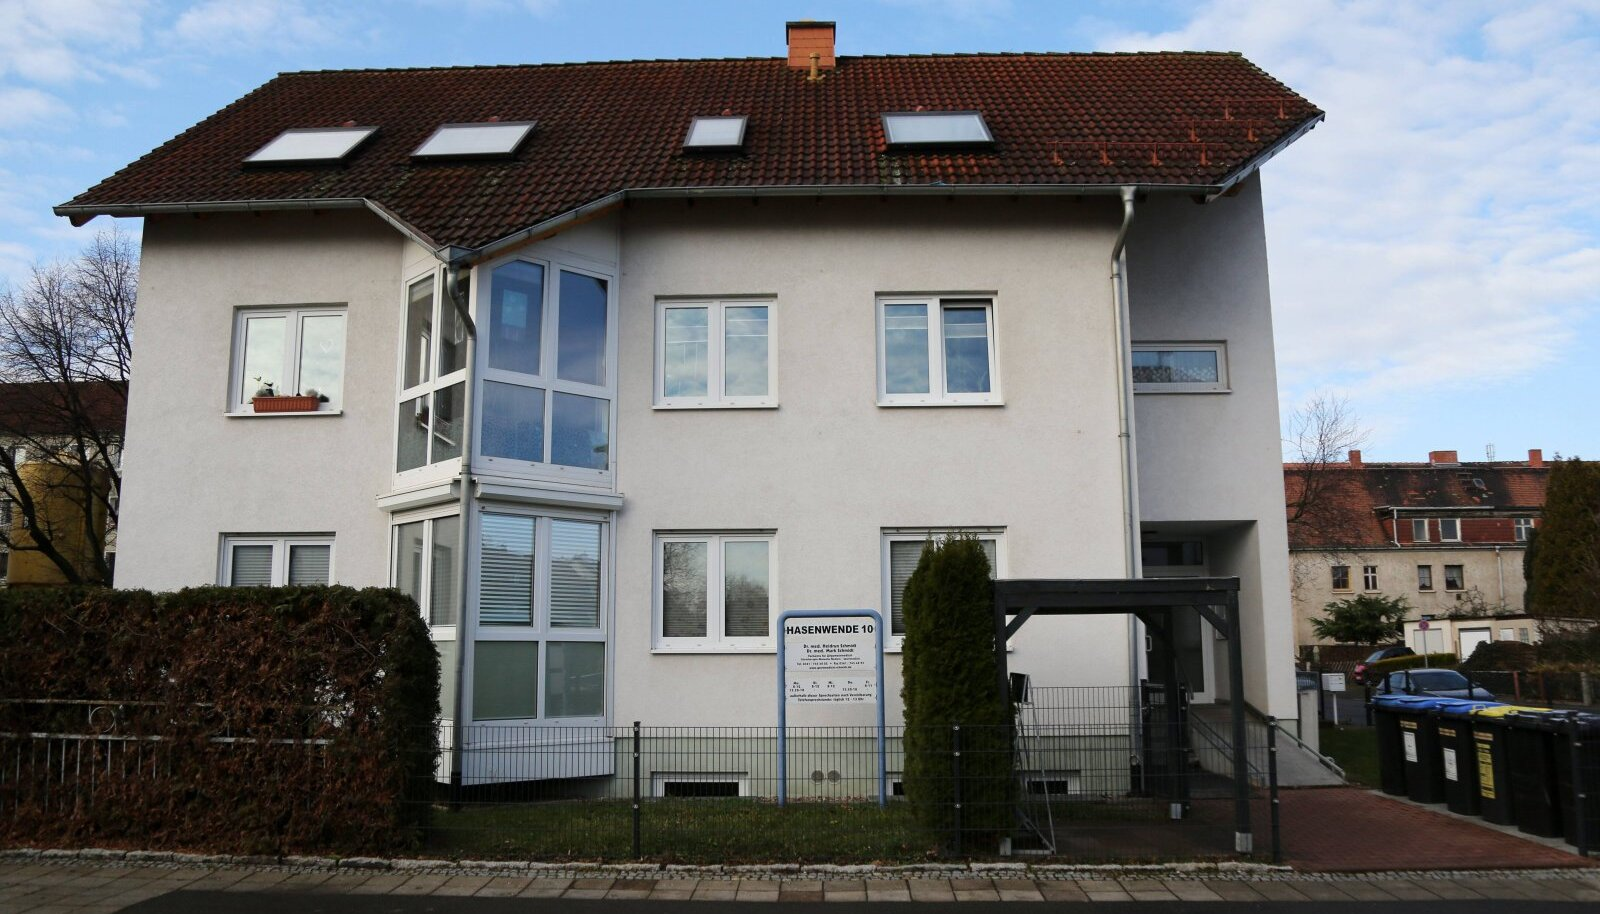 Erfurti maja, kus Mark Schmidt dopingulaborit pidas